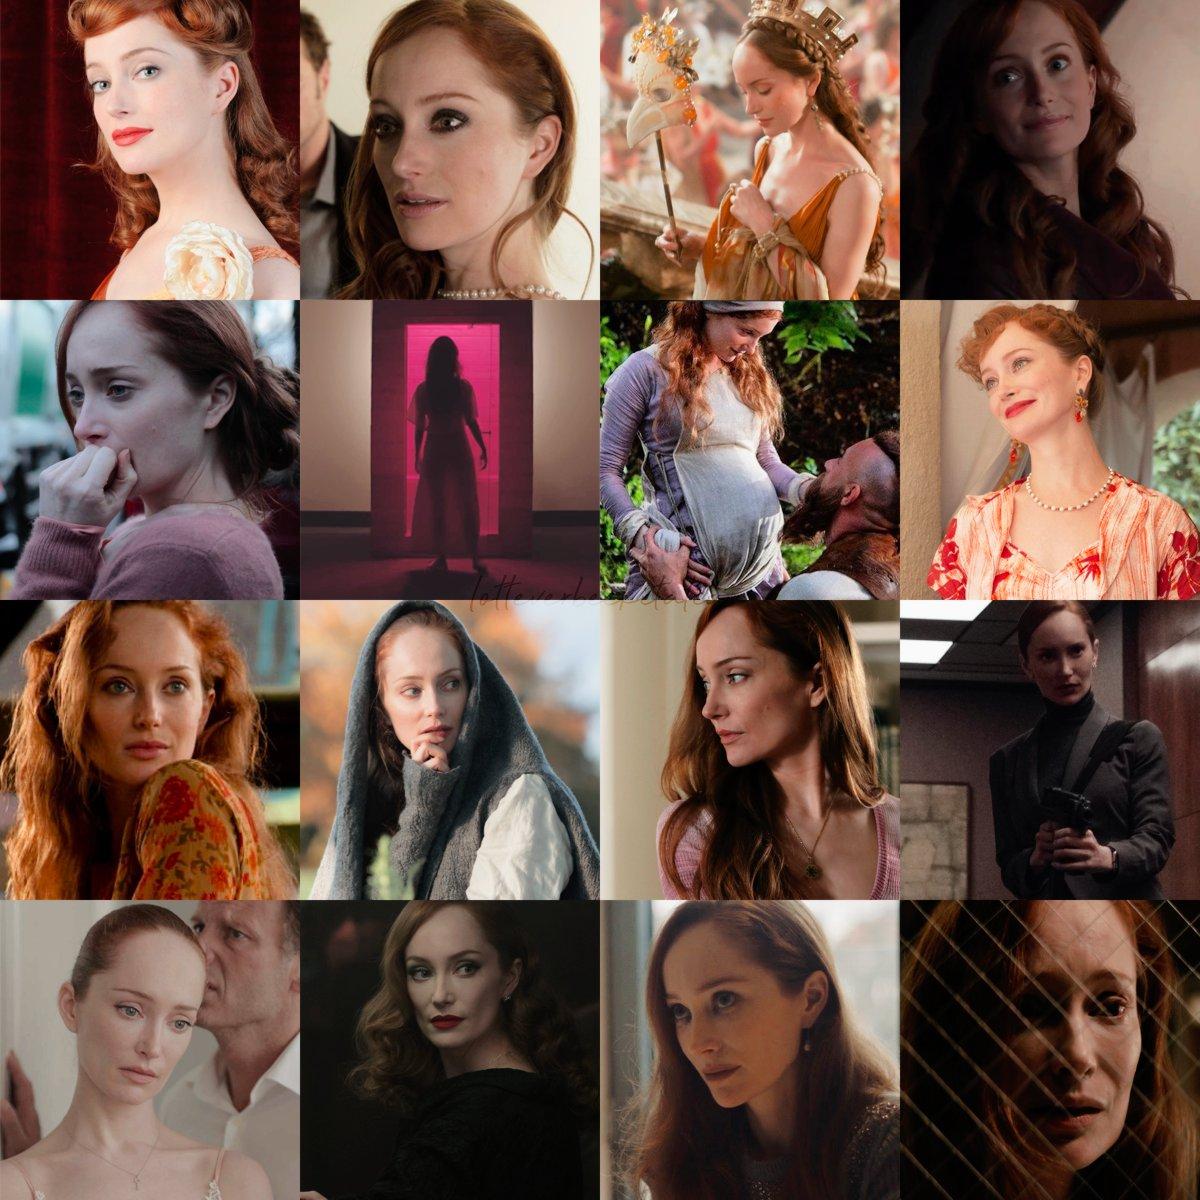 A decade of (talent) Lotte Verbeek. ☄ @lotteverbeek1 #lotteverbeek